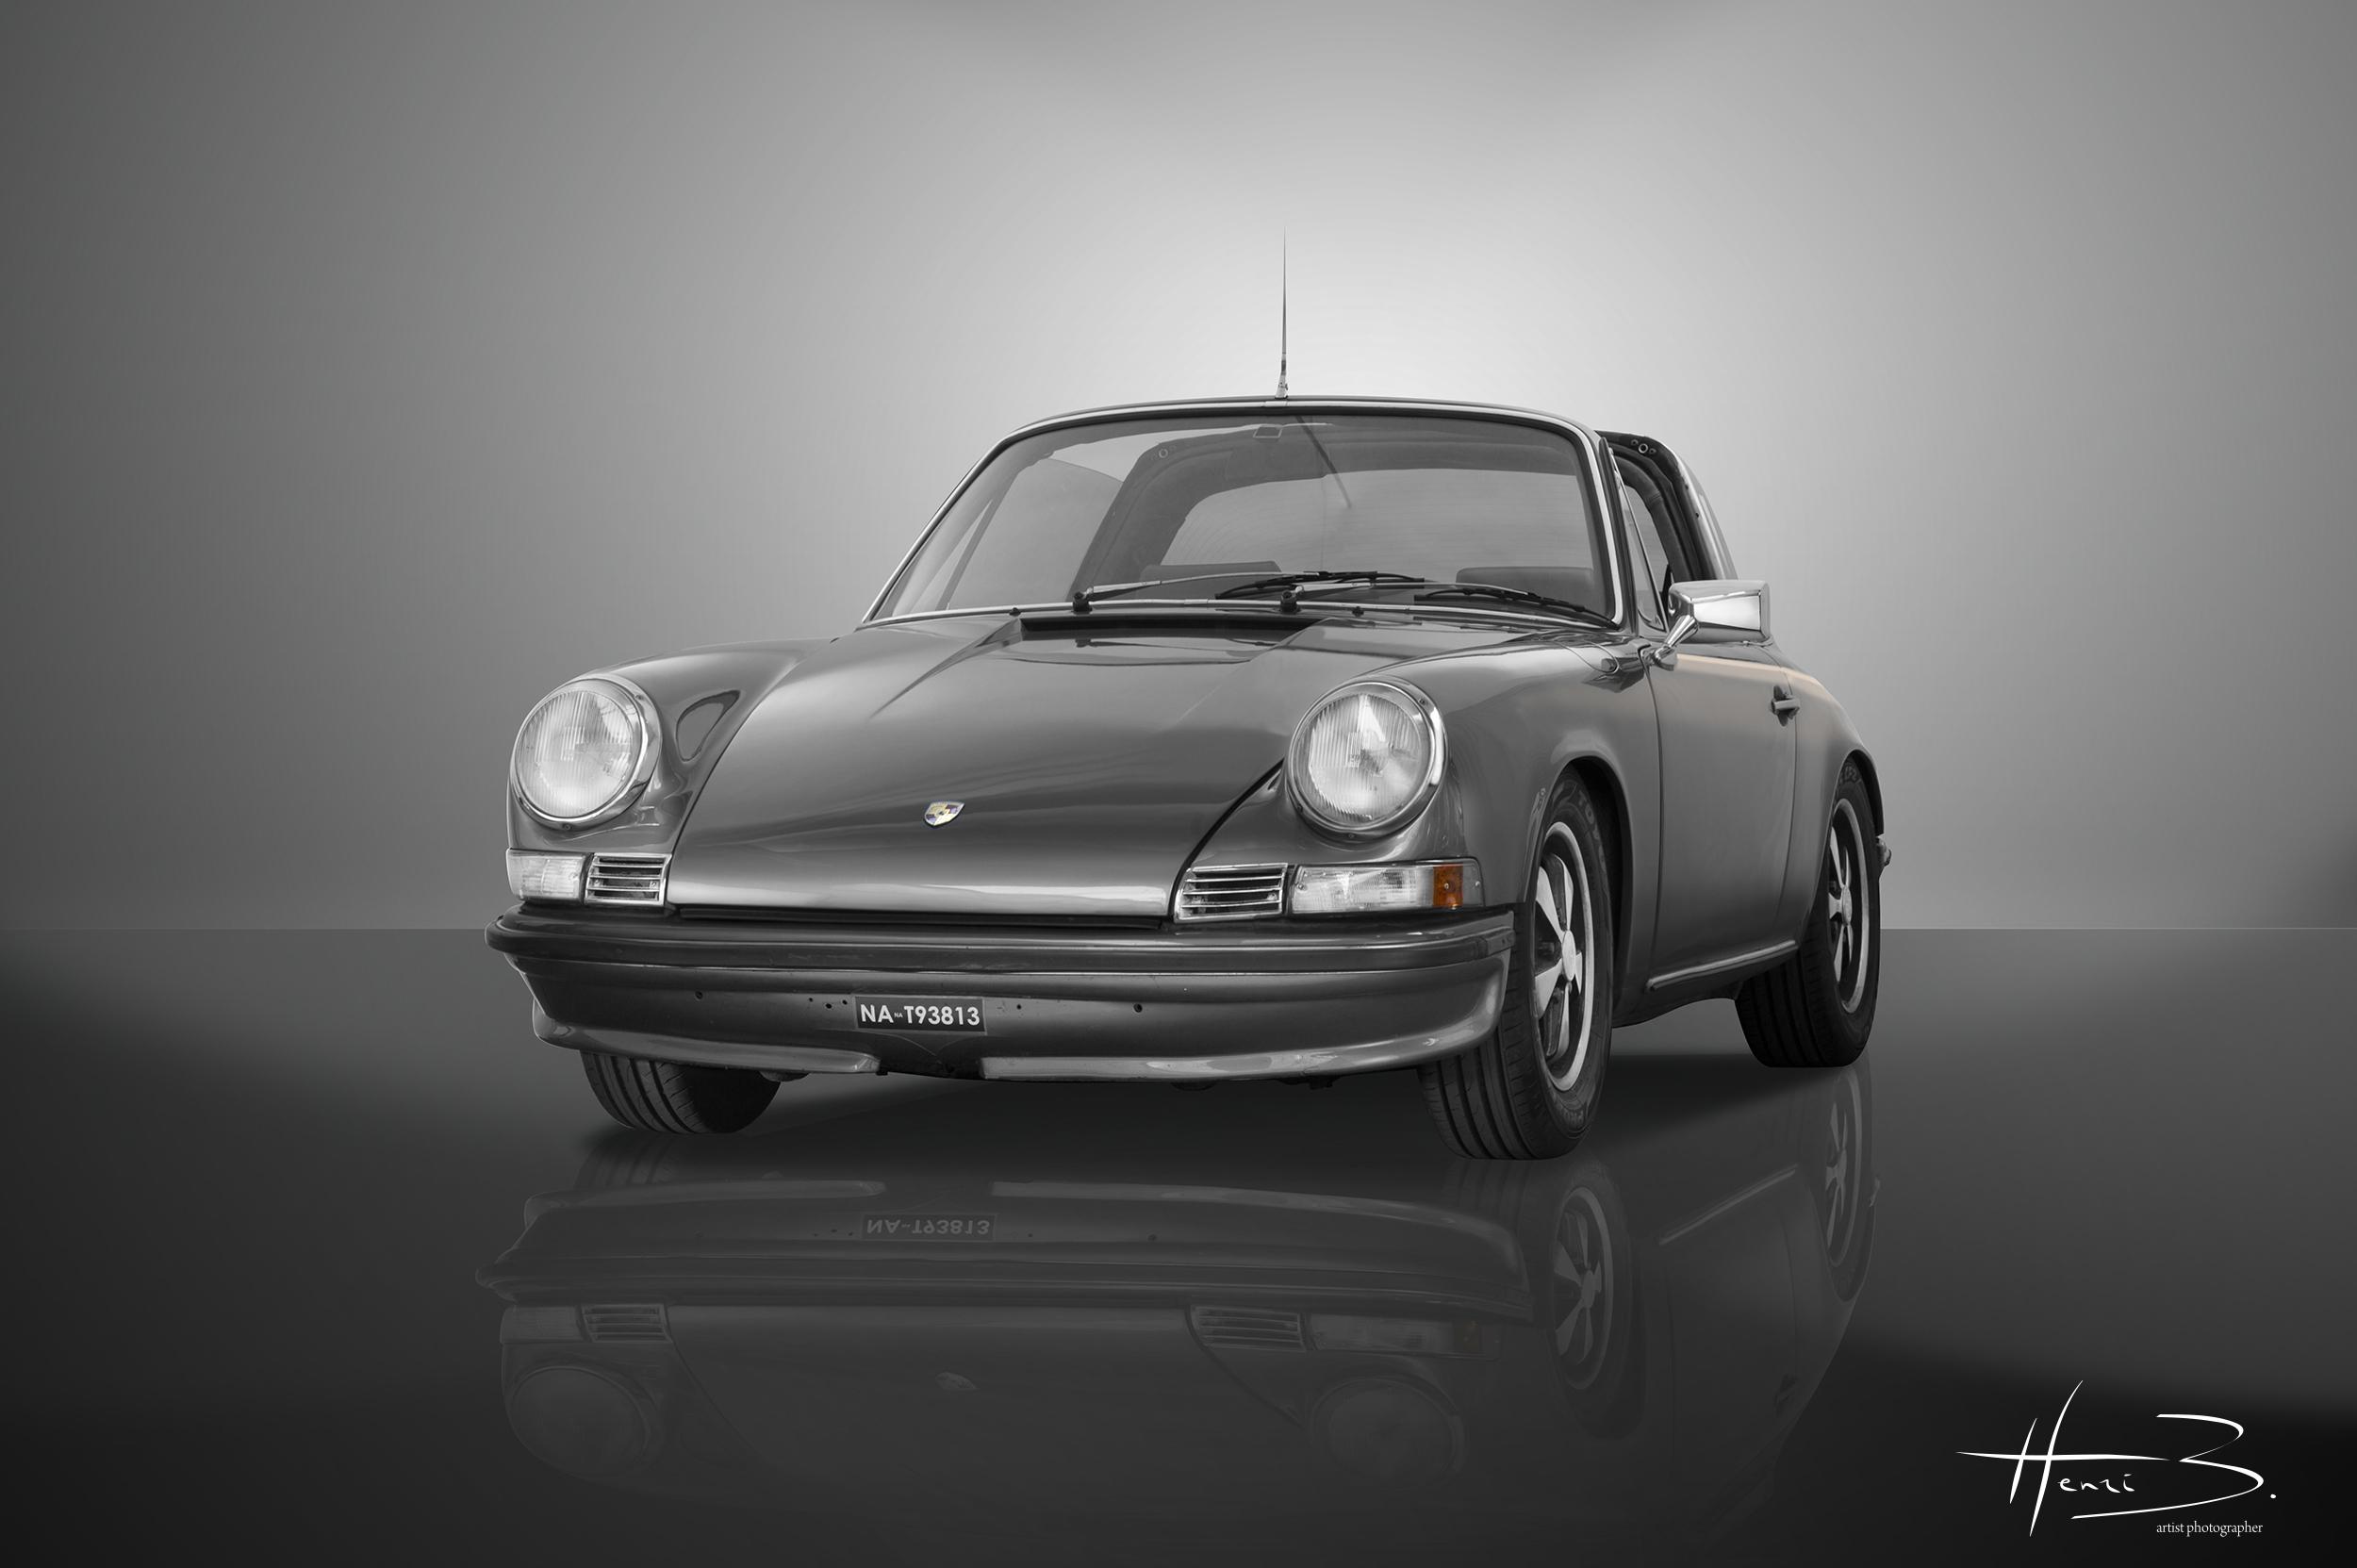 Porshe 911 Targa de 1969